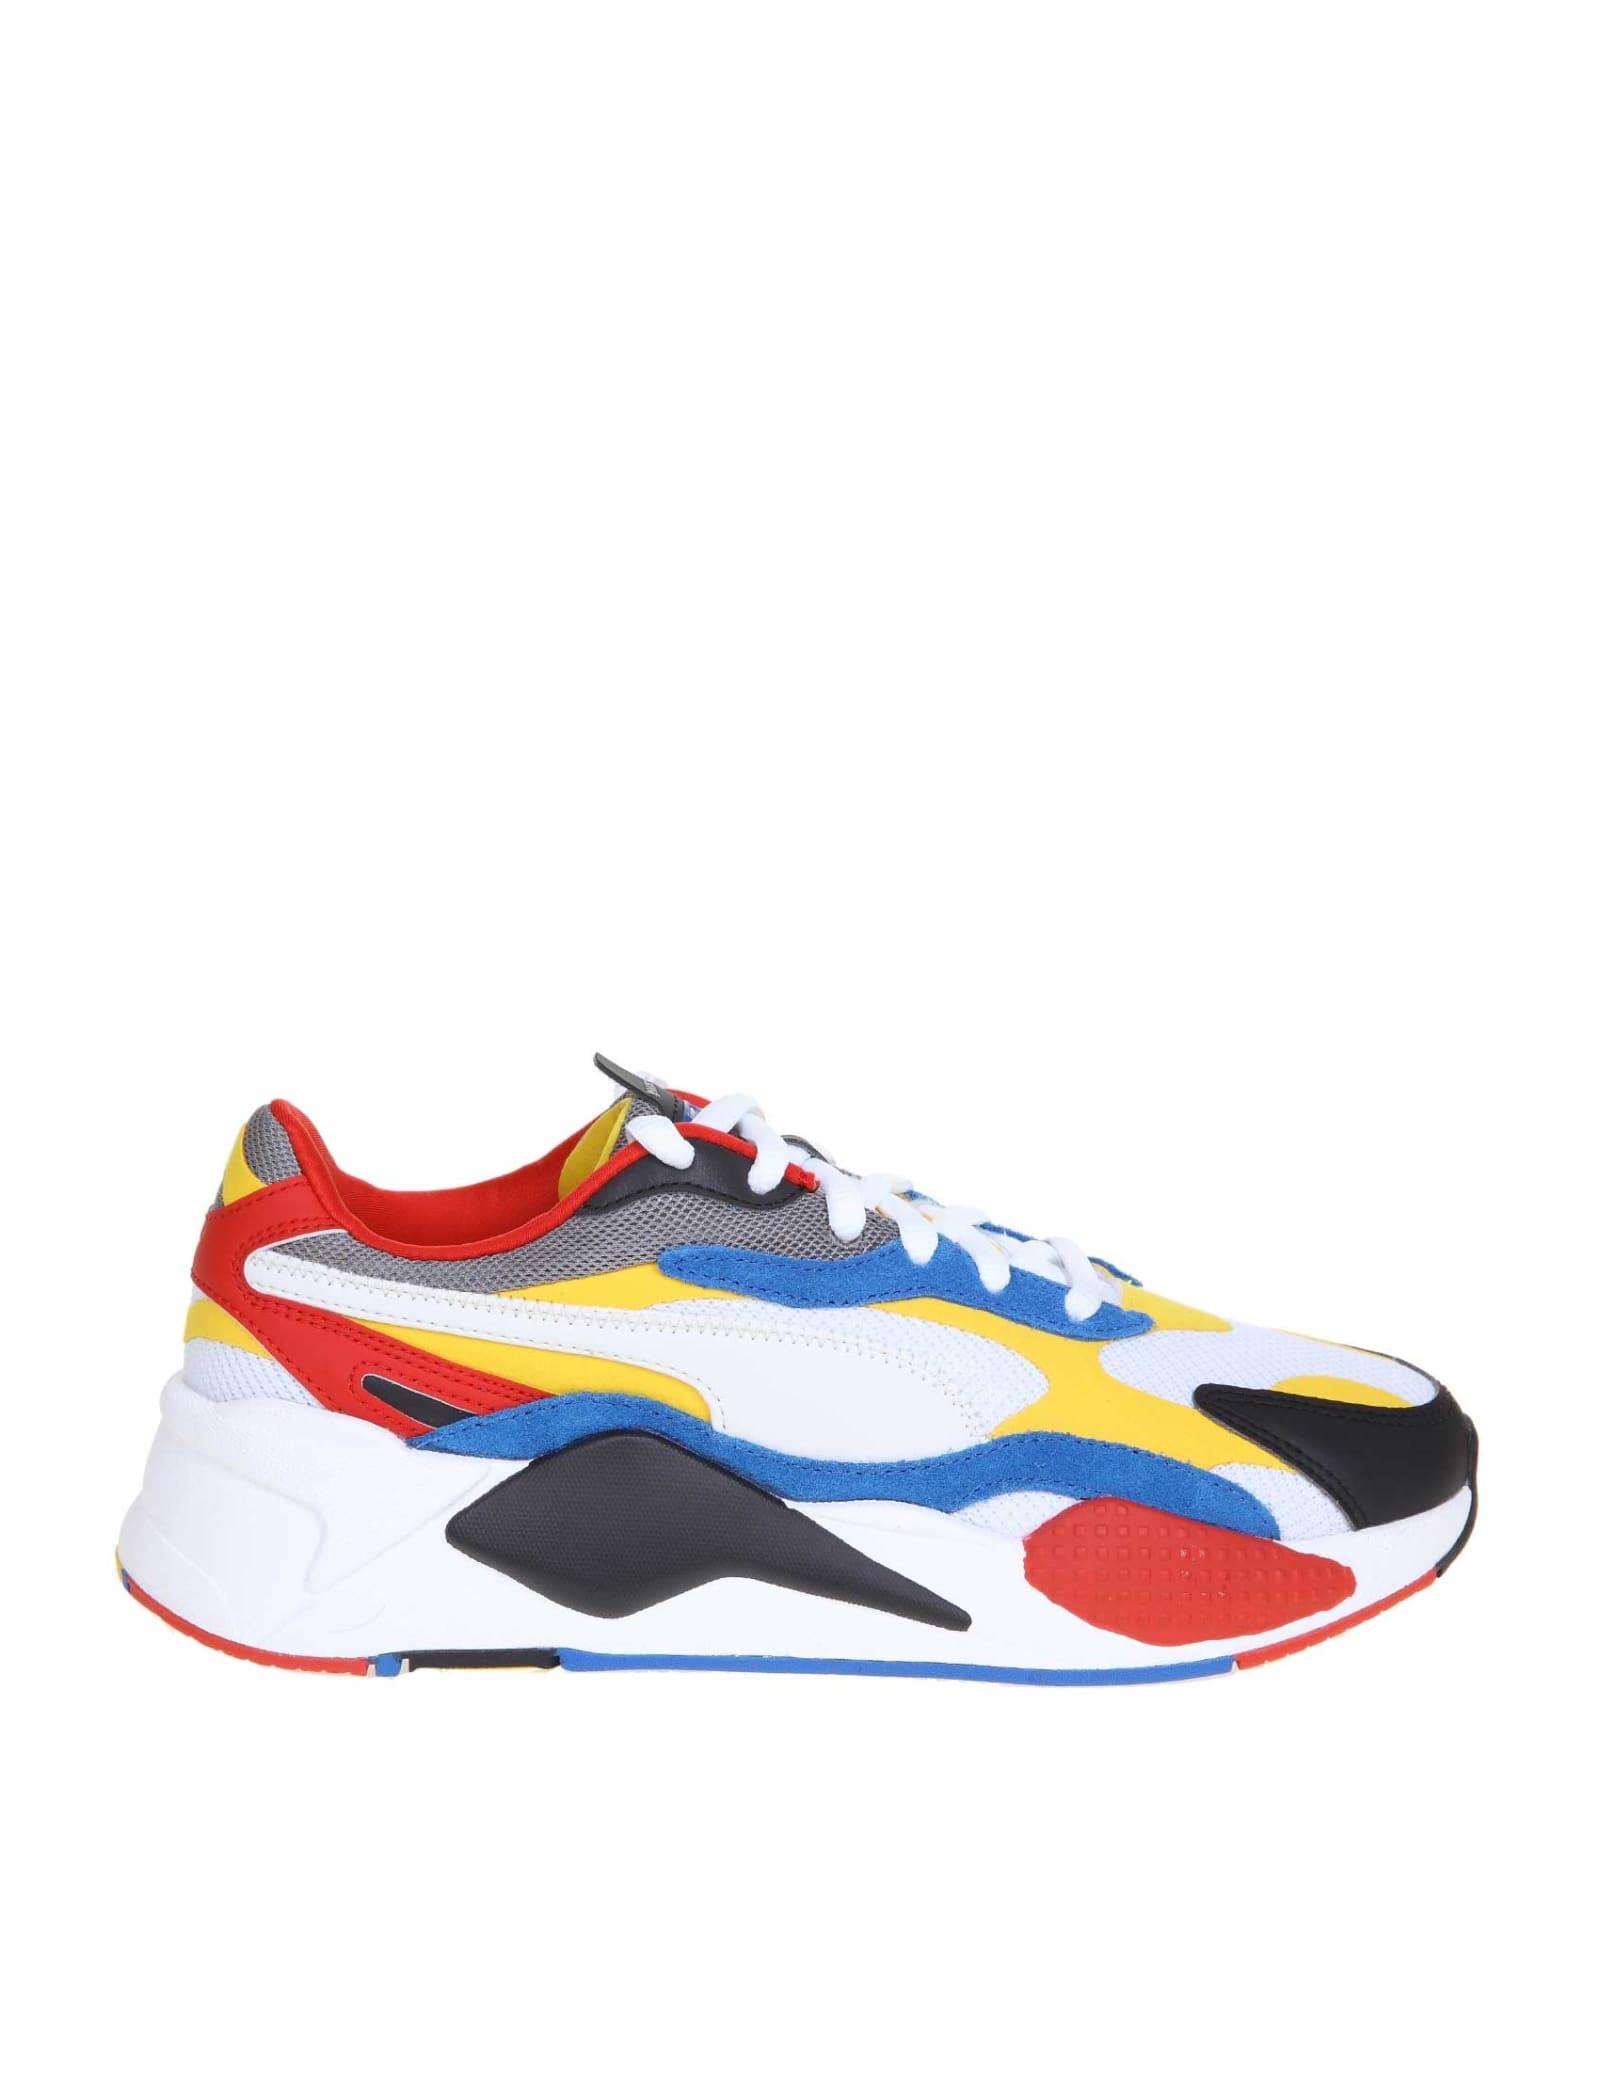 Puma Sneakers | italist, ALWAYS LIKE A SALE